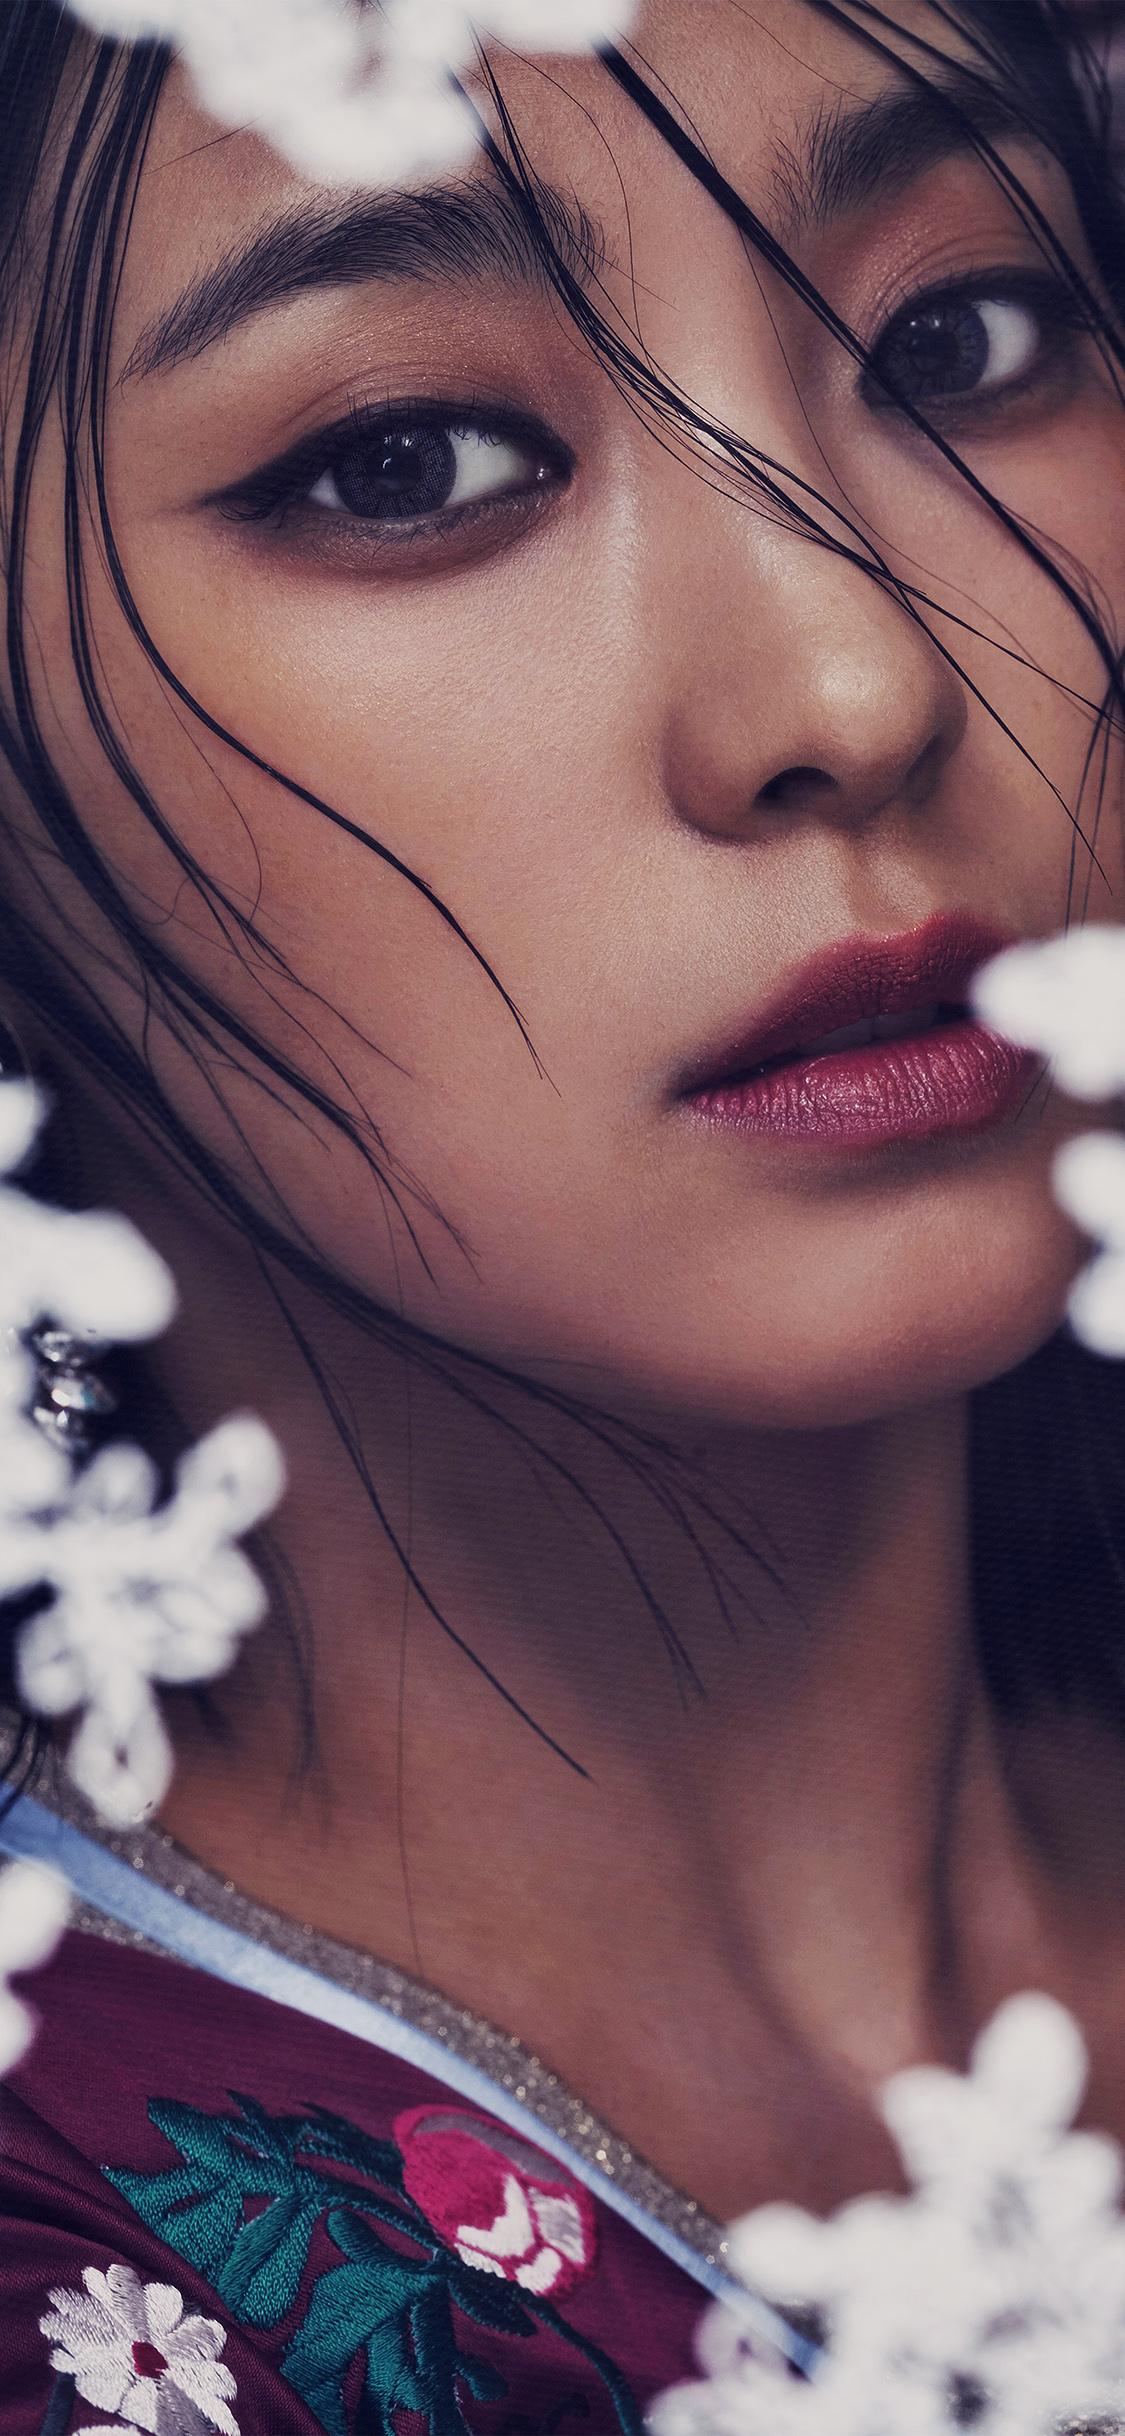 iPhoneXpapers.com-Apple-iPhone-wallpaper-hj20-kpop-sistar-summer-girl-face-music